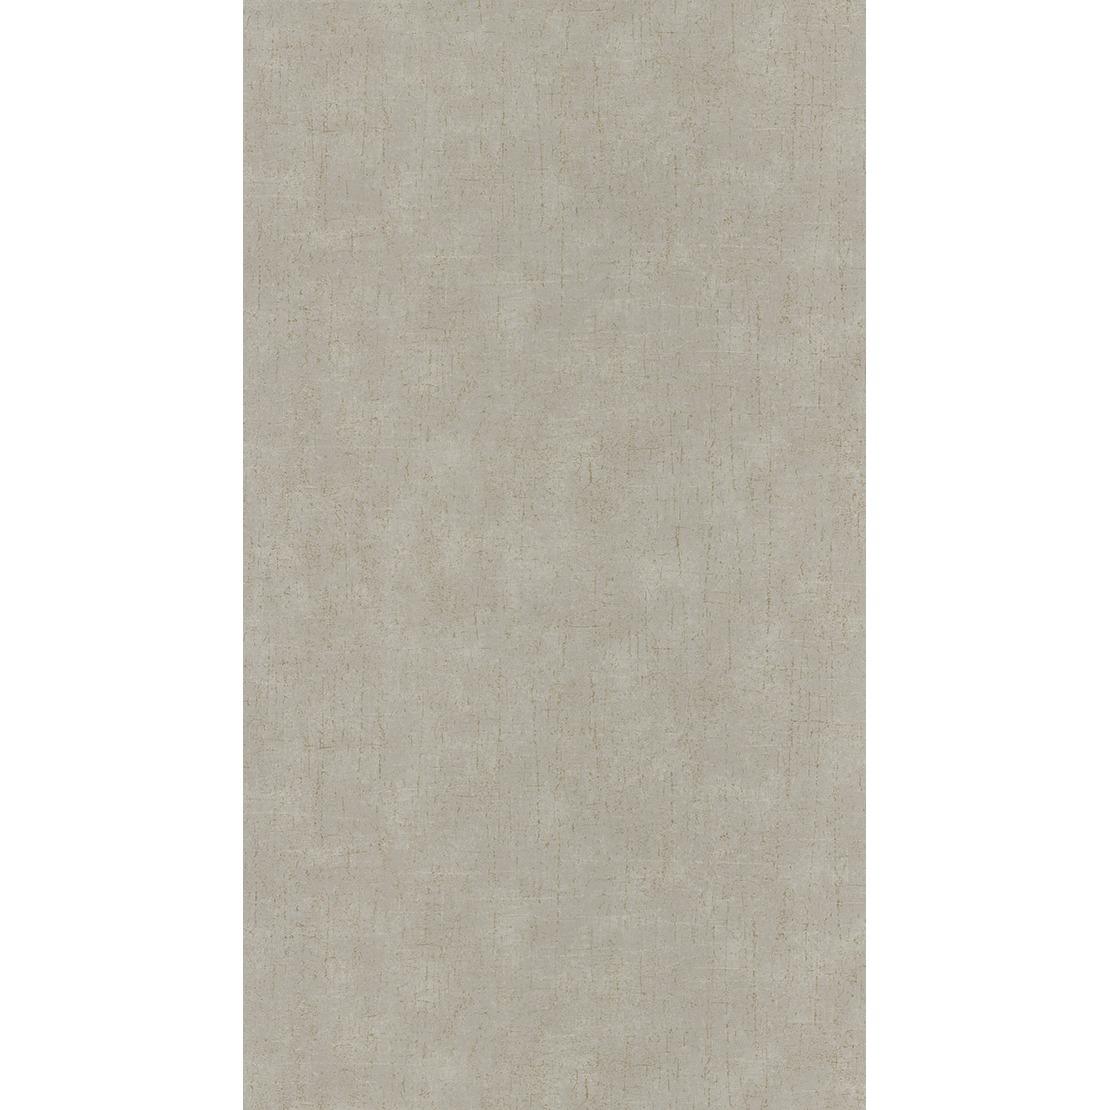 Французские обои Casadeco,  коллекция Oxyde, артикулOXY29111221